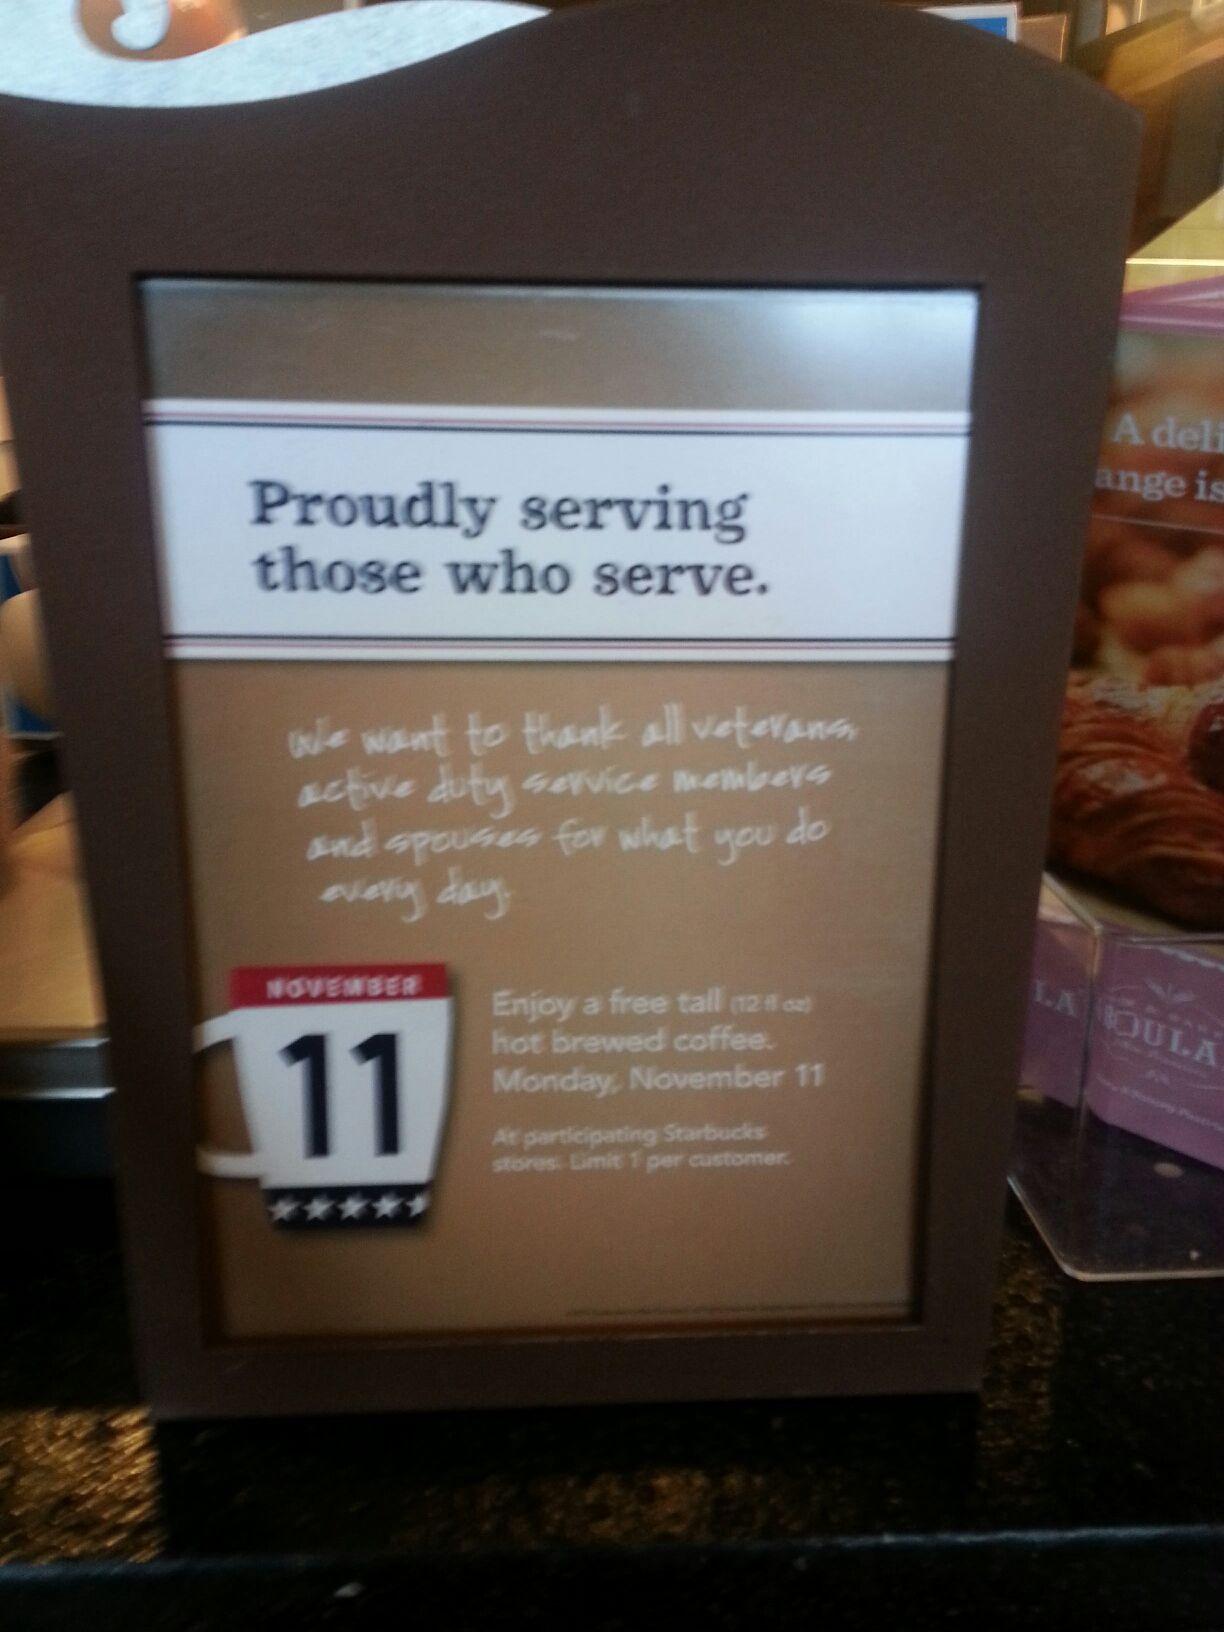 Free Tall Coffee at Starbucks for Veterans on Veteran's